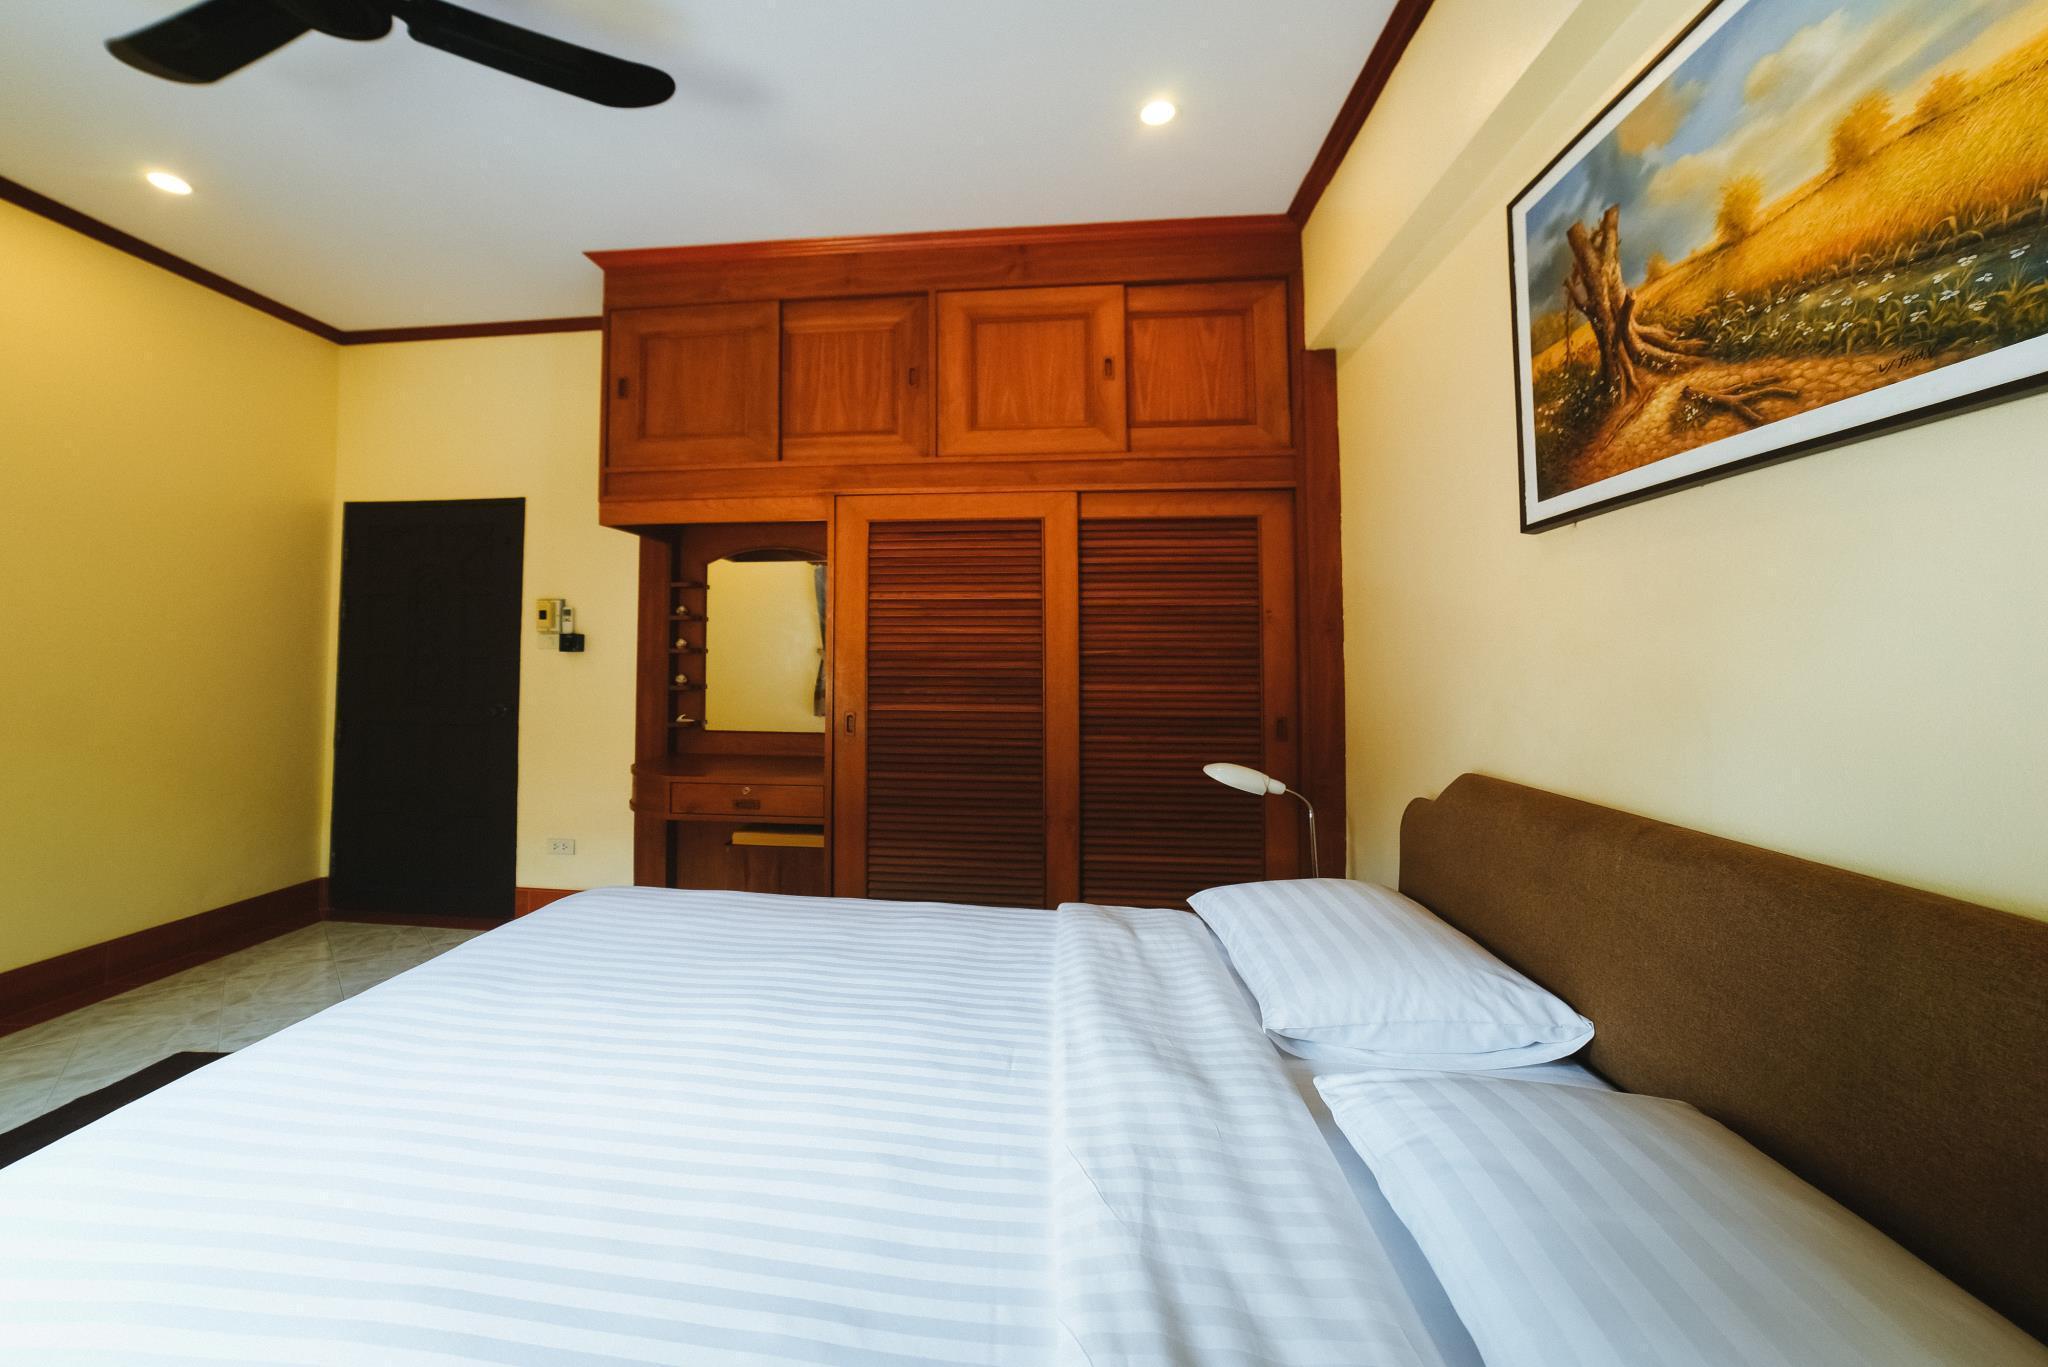 5 Bedrooms Pool Villa Behind Phuket Zoo